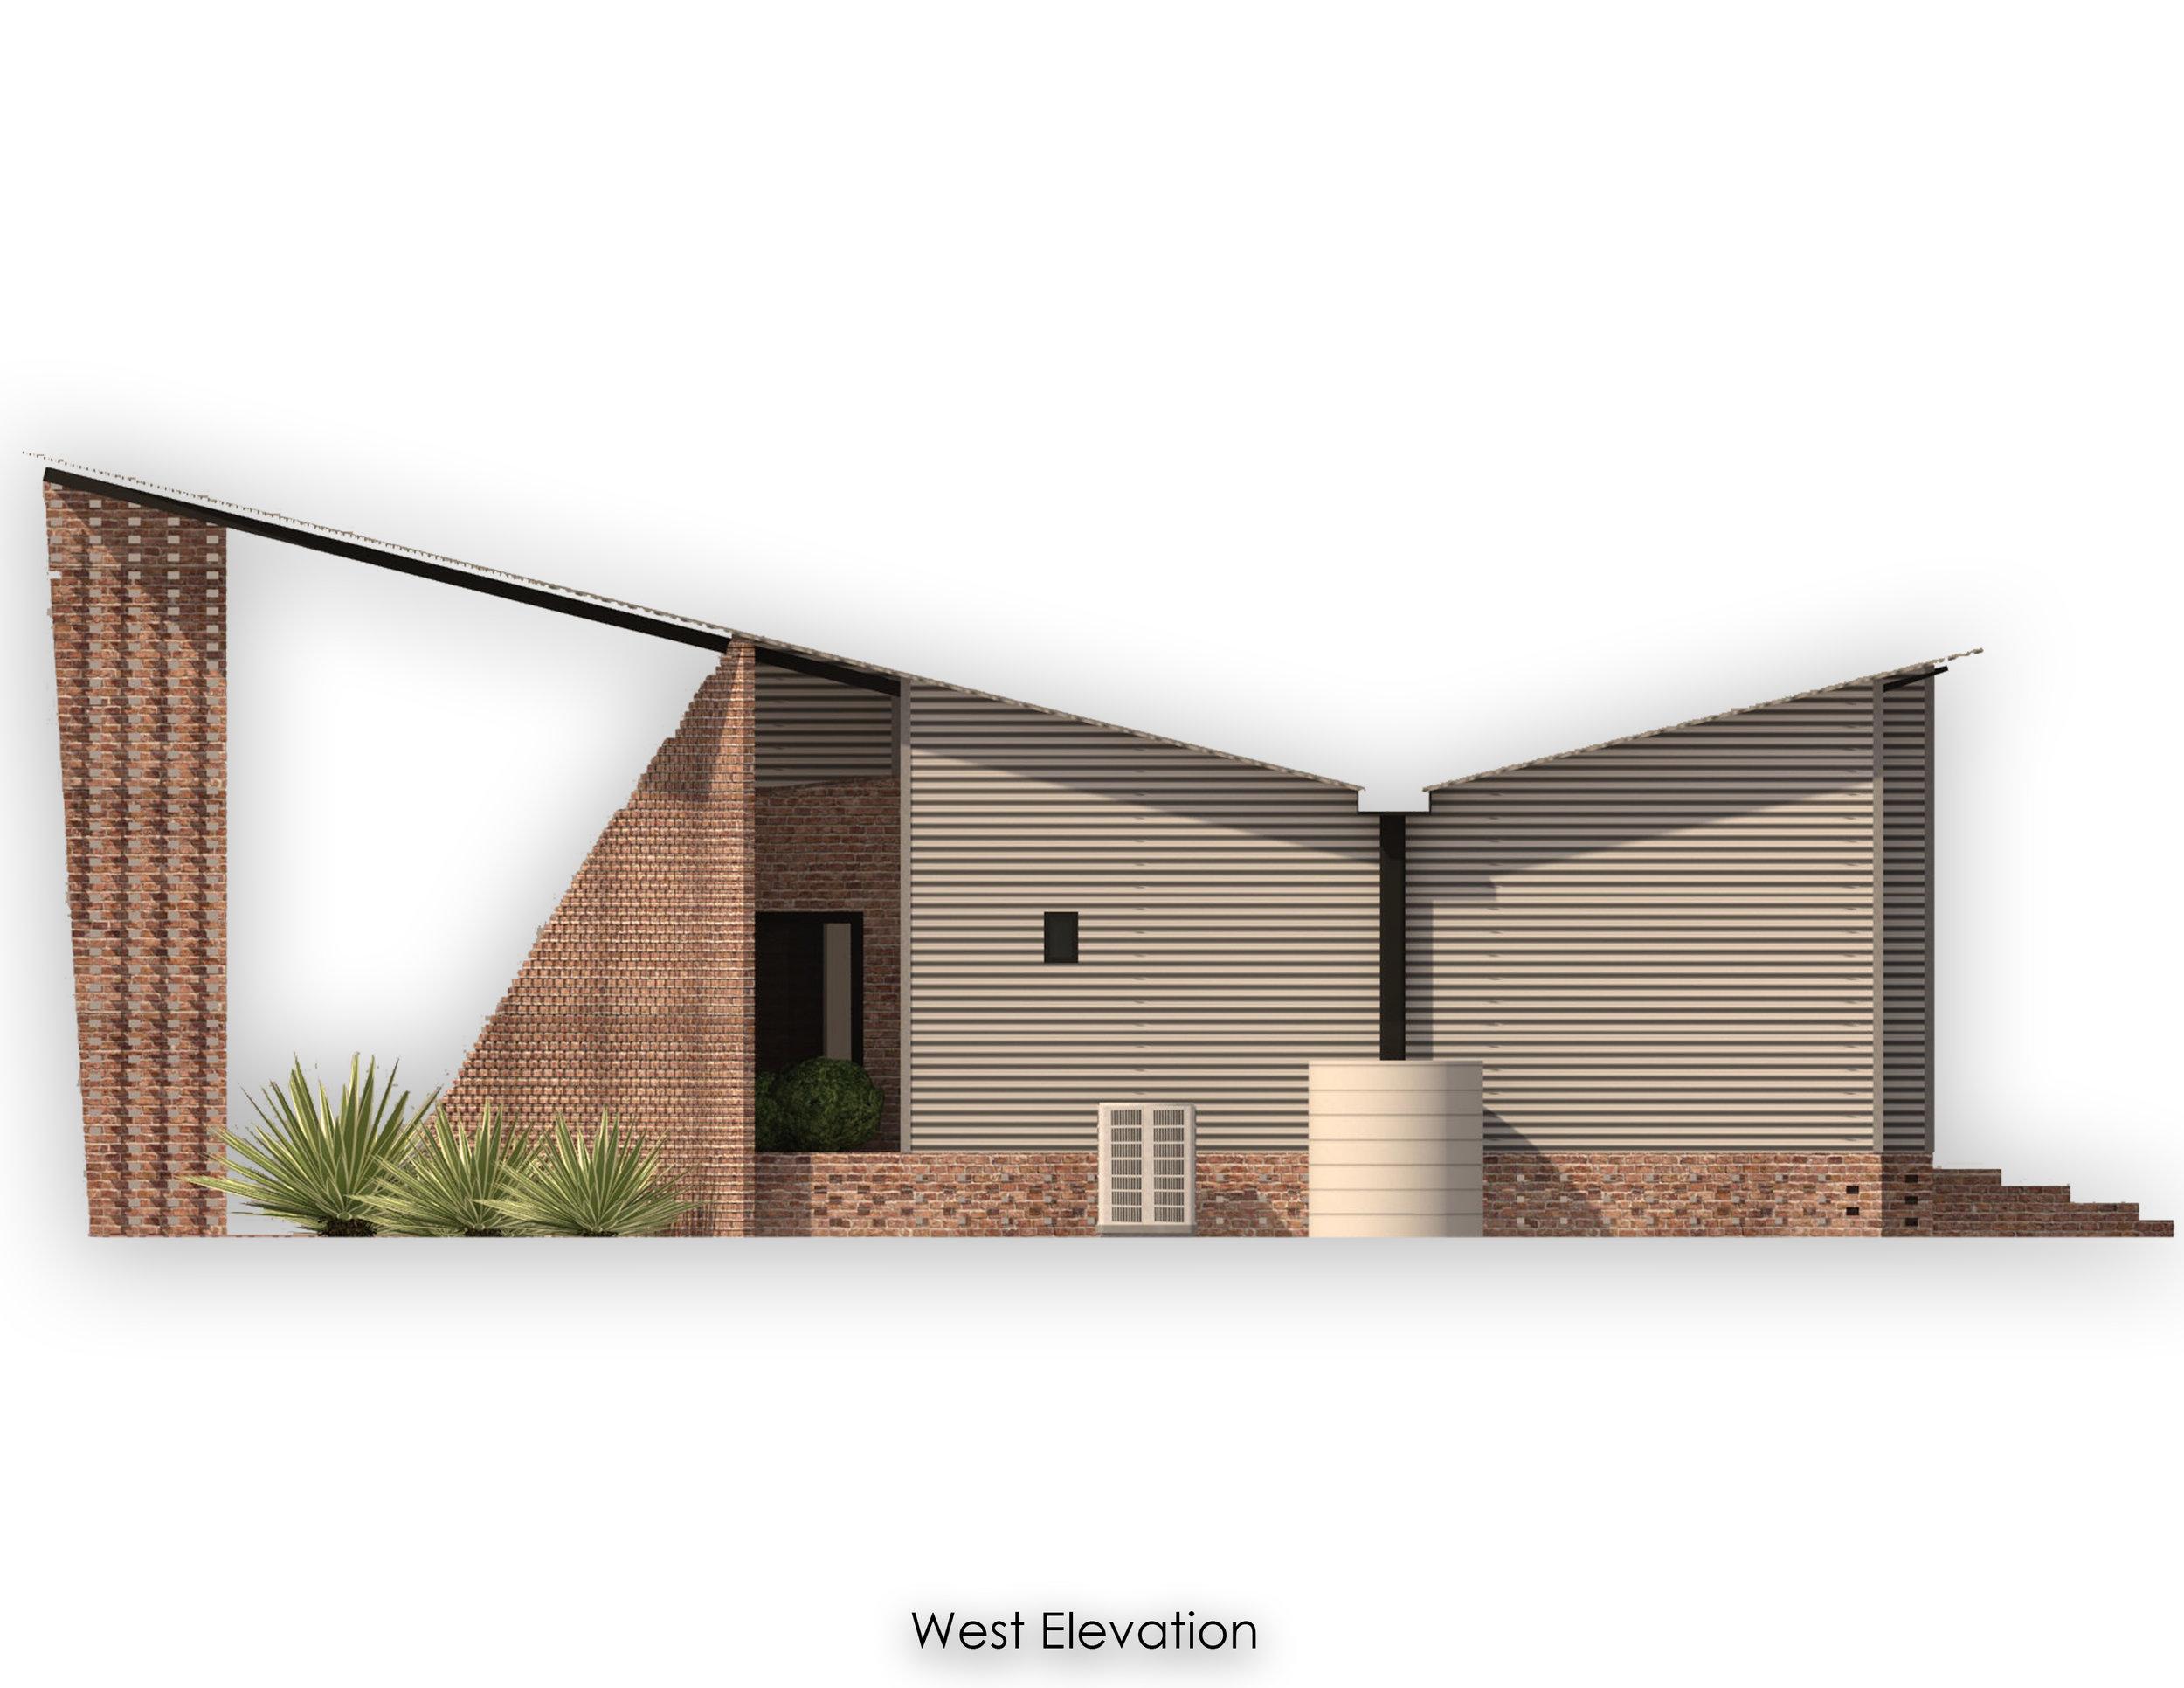 7_West_Elevation.jpg